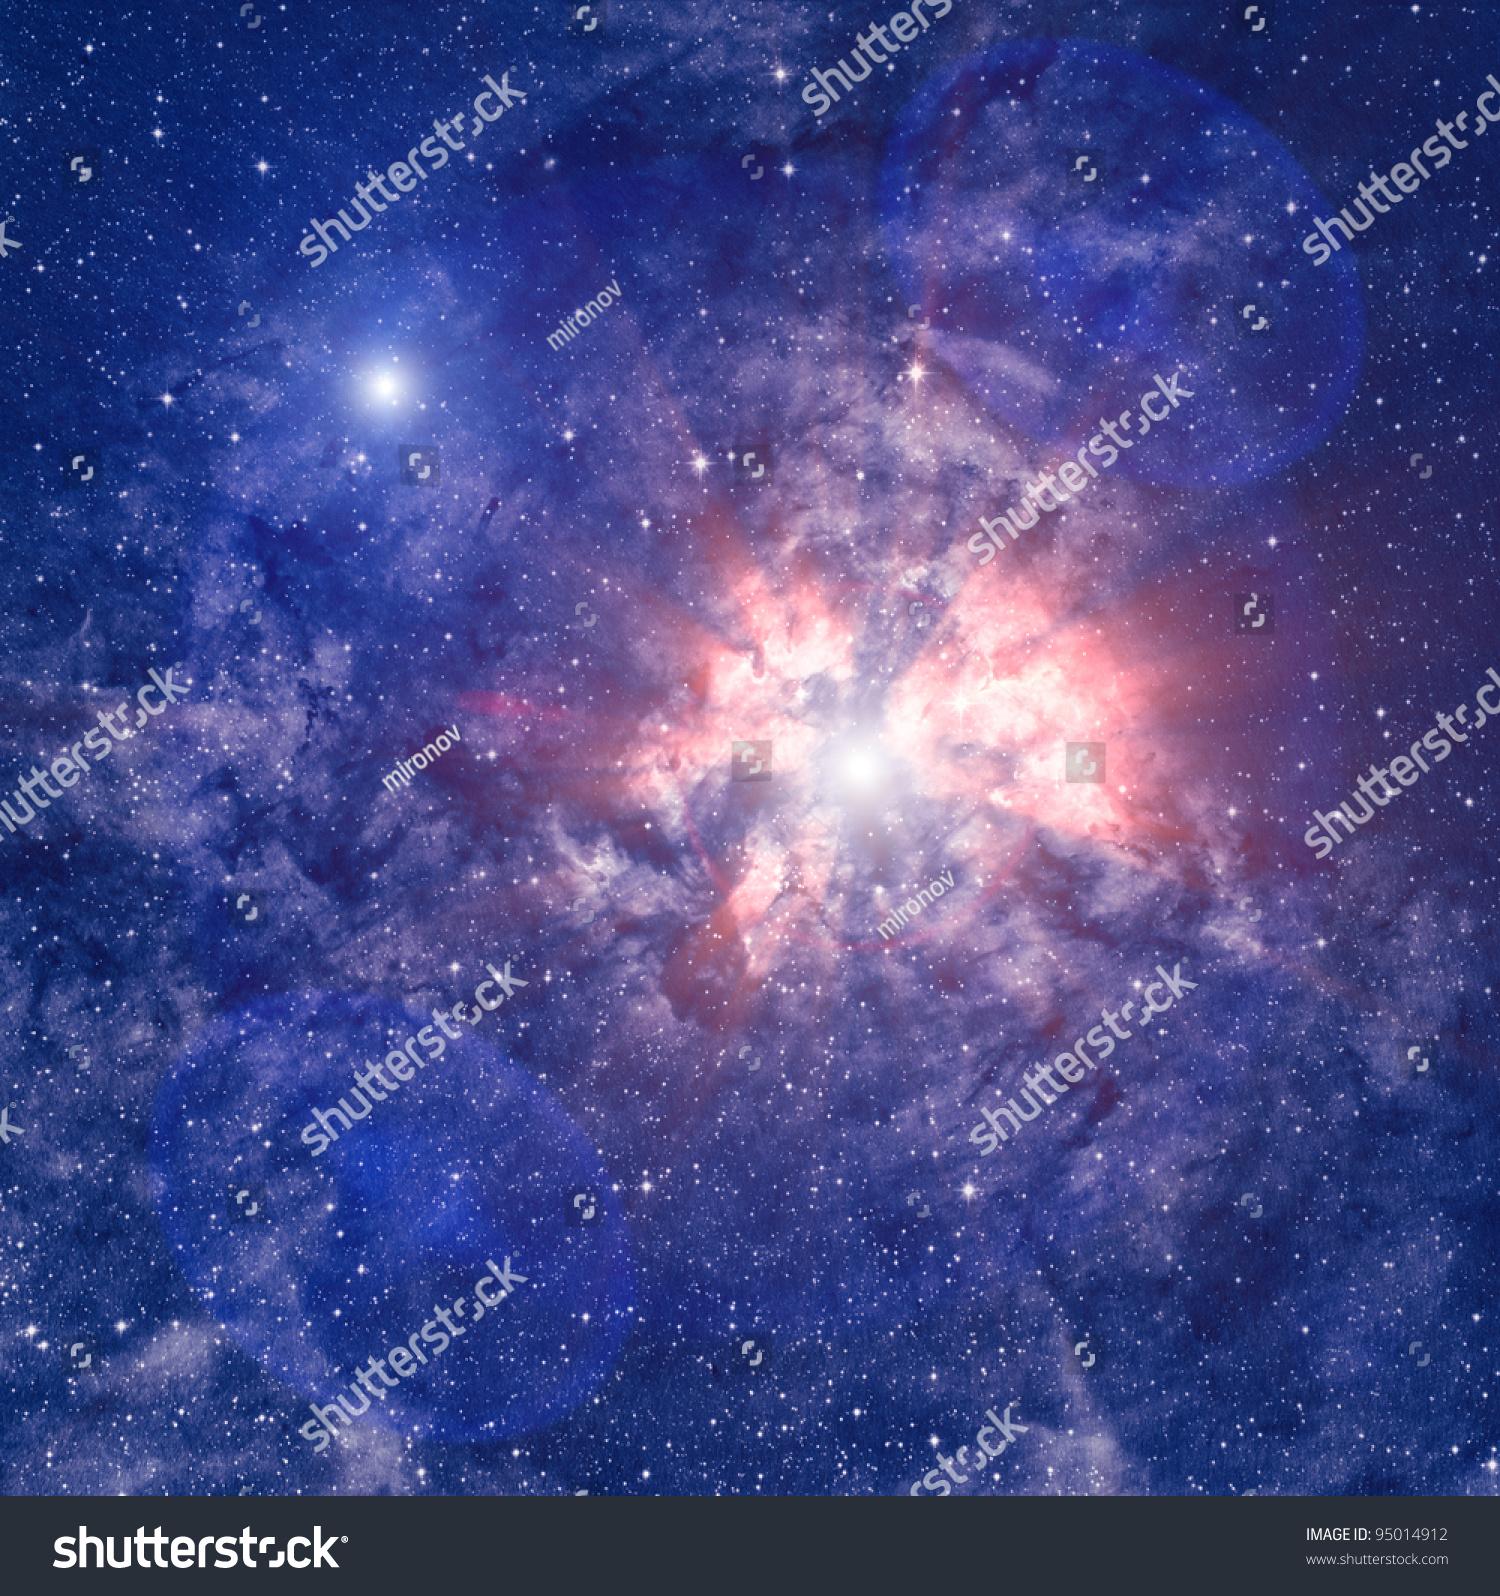 Heaven Nebula Stock Photo 95014912 : Shutterstock